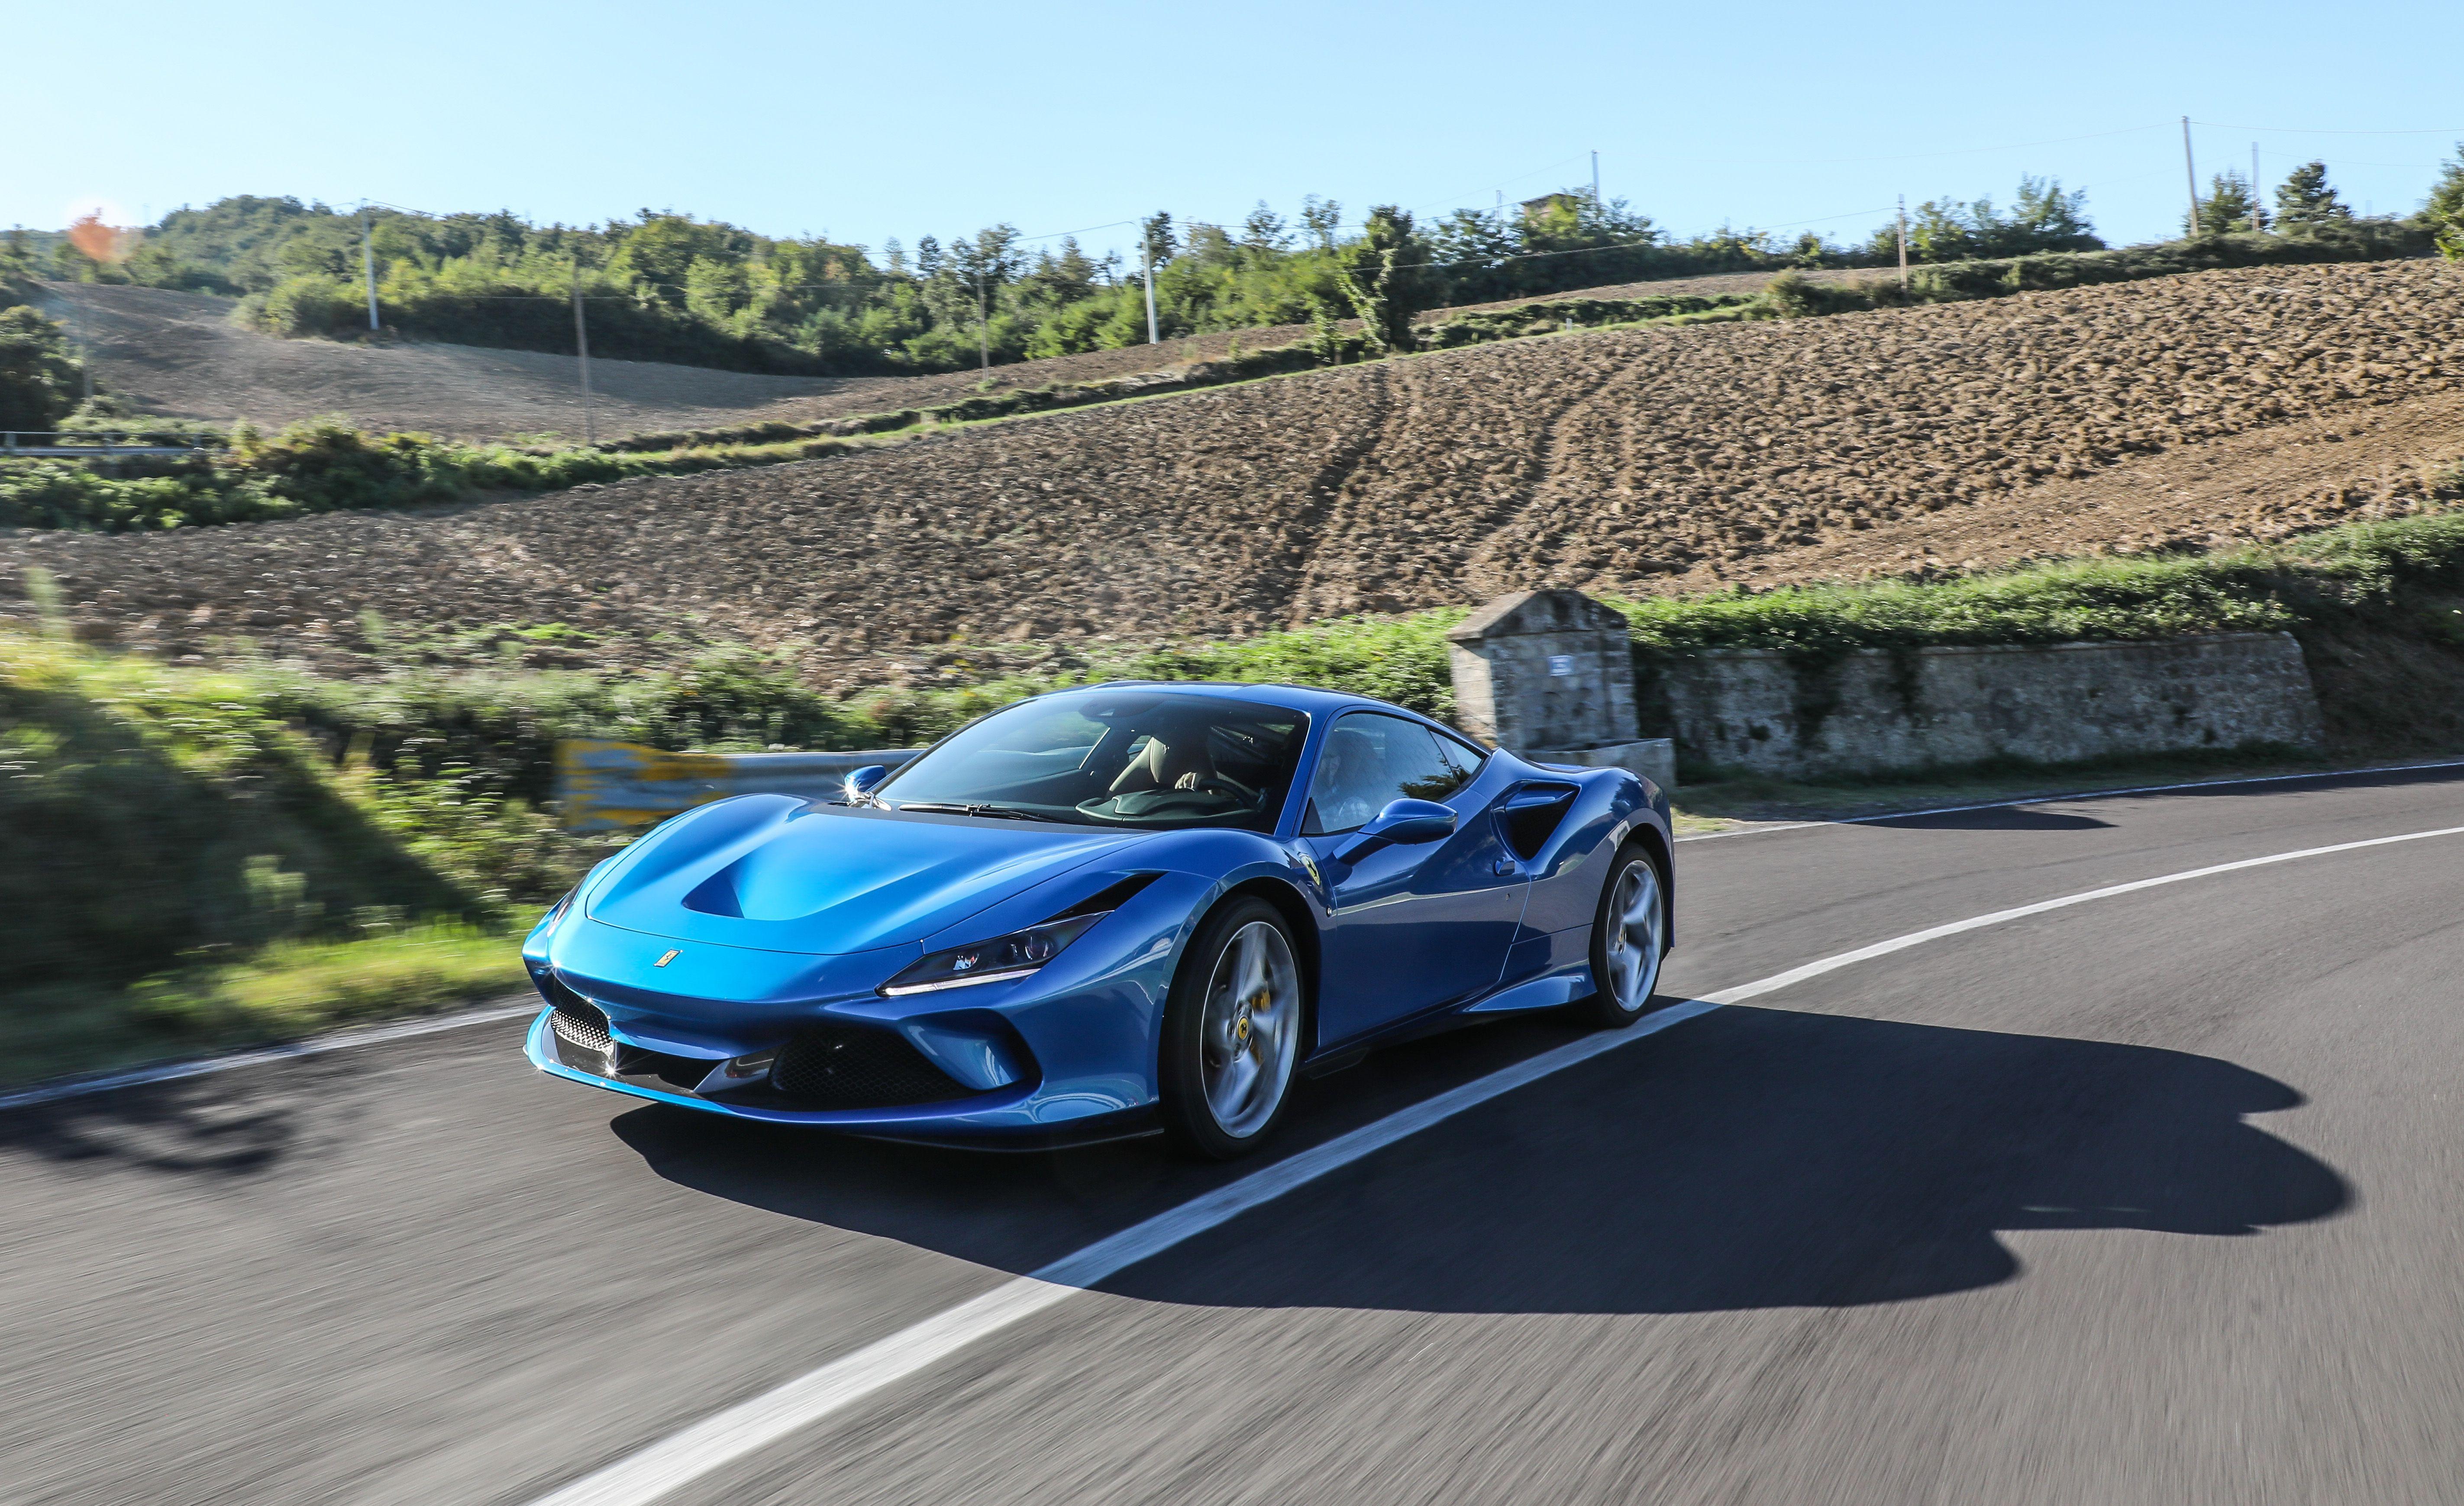 2020 Ferrari F8 Tributo Is An Evolutionary Masterpiece